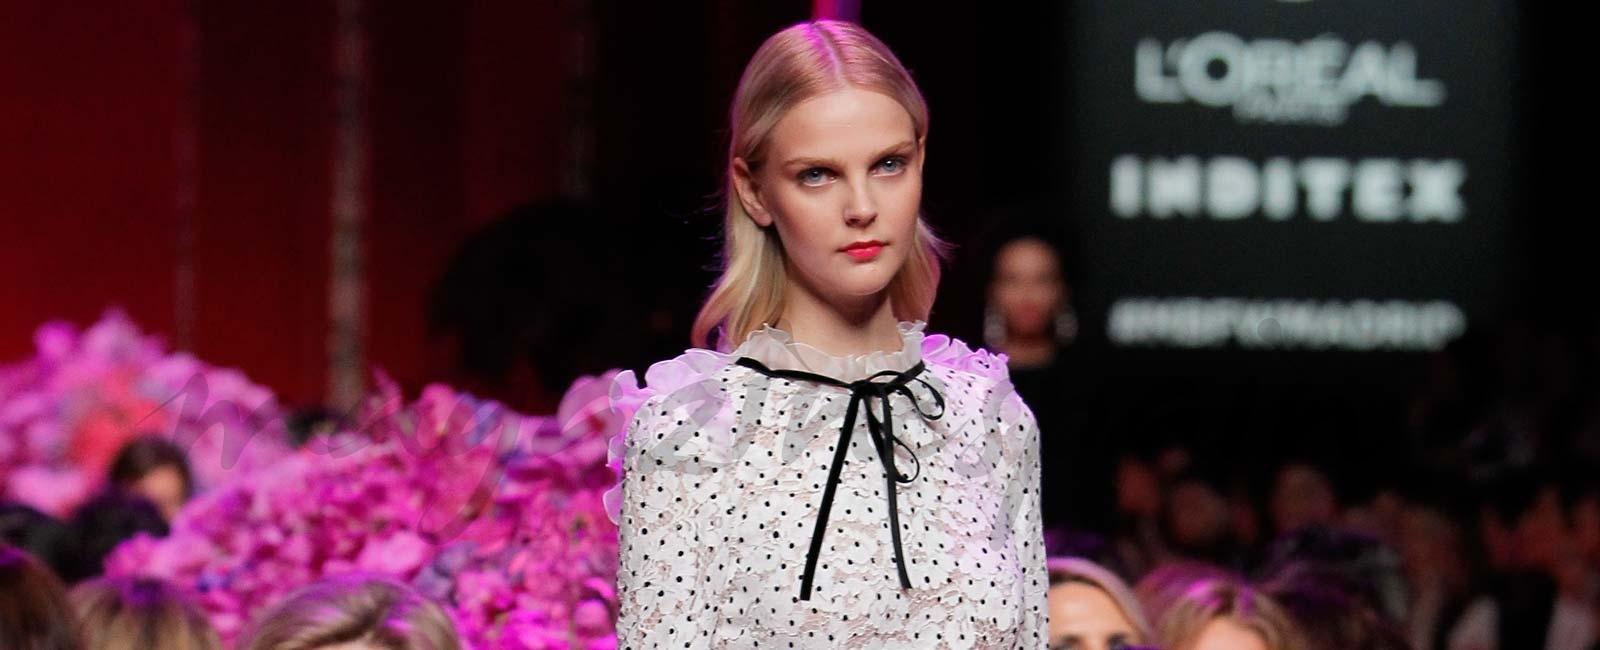 Mercedes Fashion Week Madrid: Jorge Vázquez Otoño Invierno 2018-2019